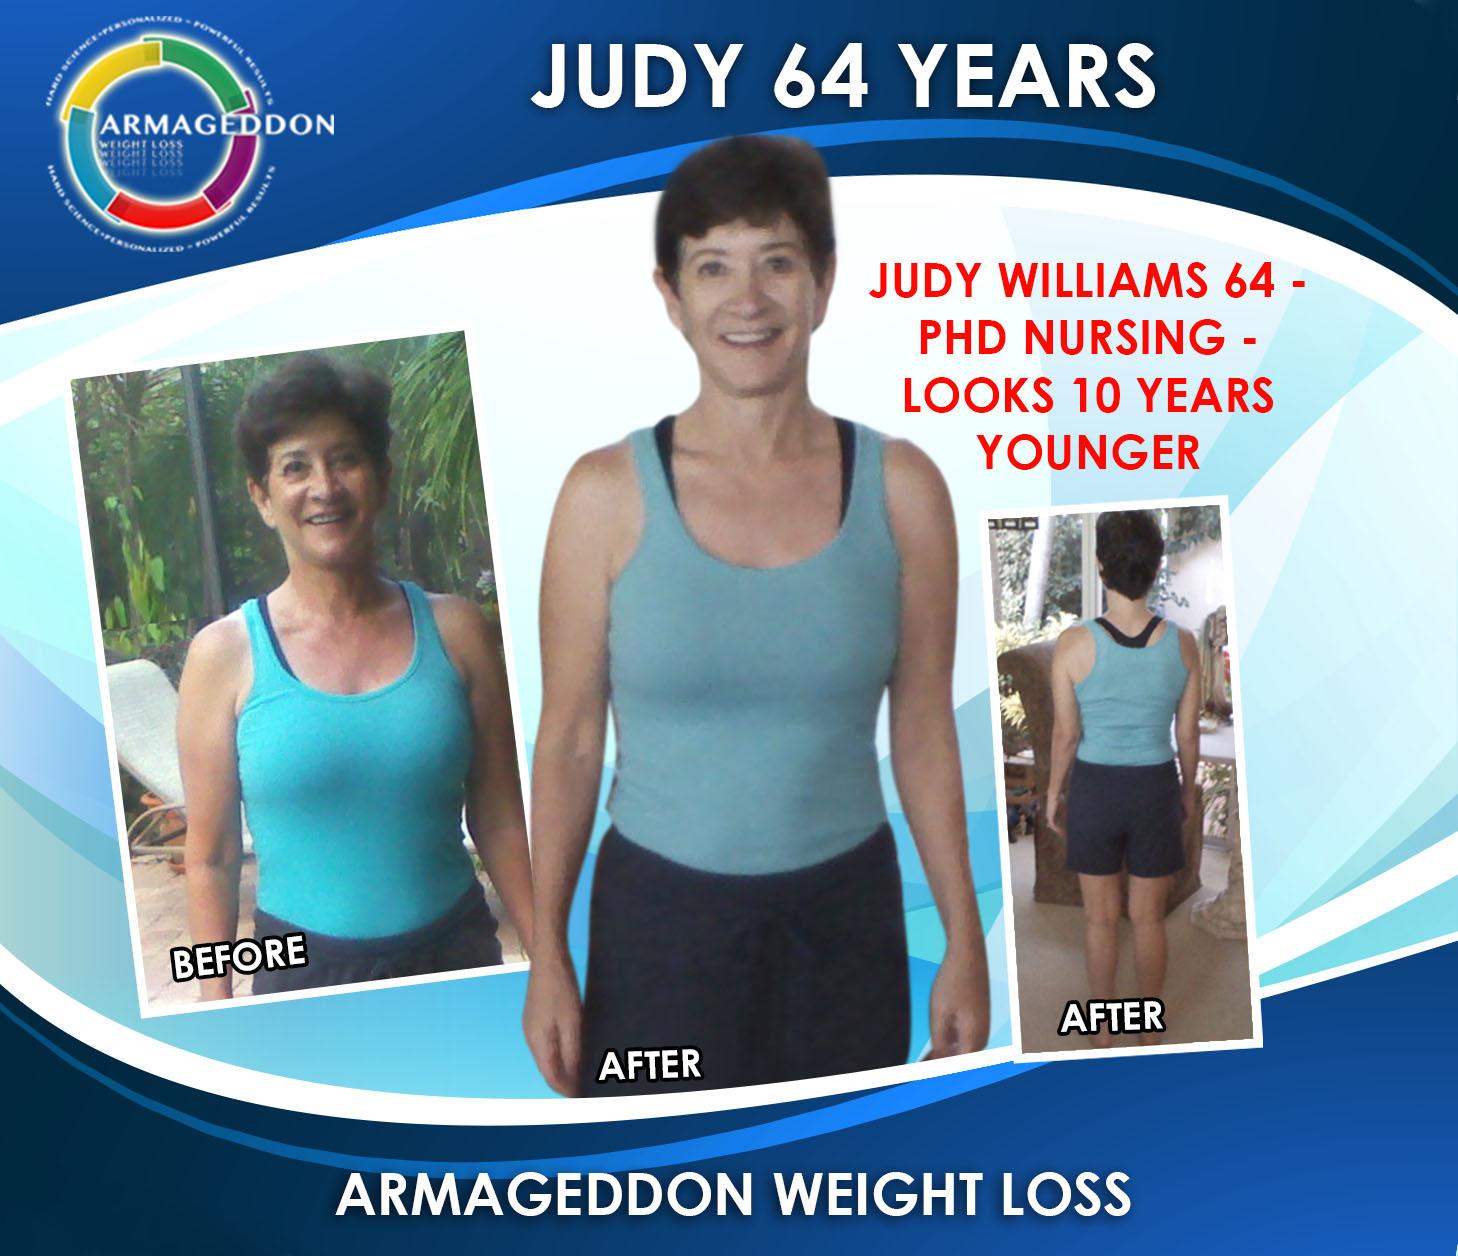 Armageddon Weight Loss Program Reviews - Weight Loss ...